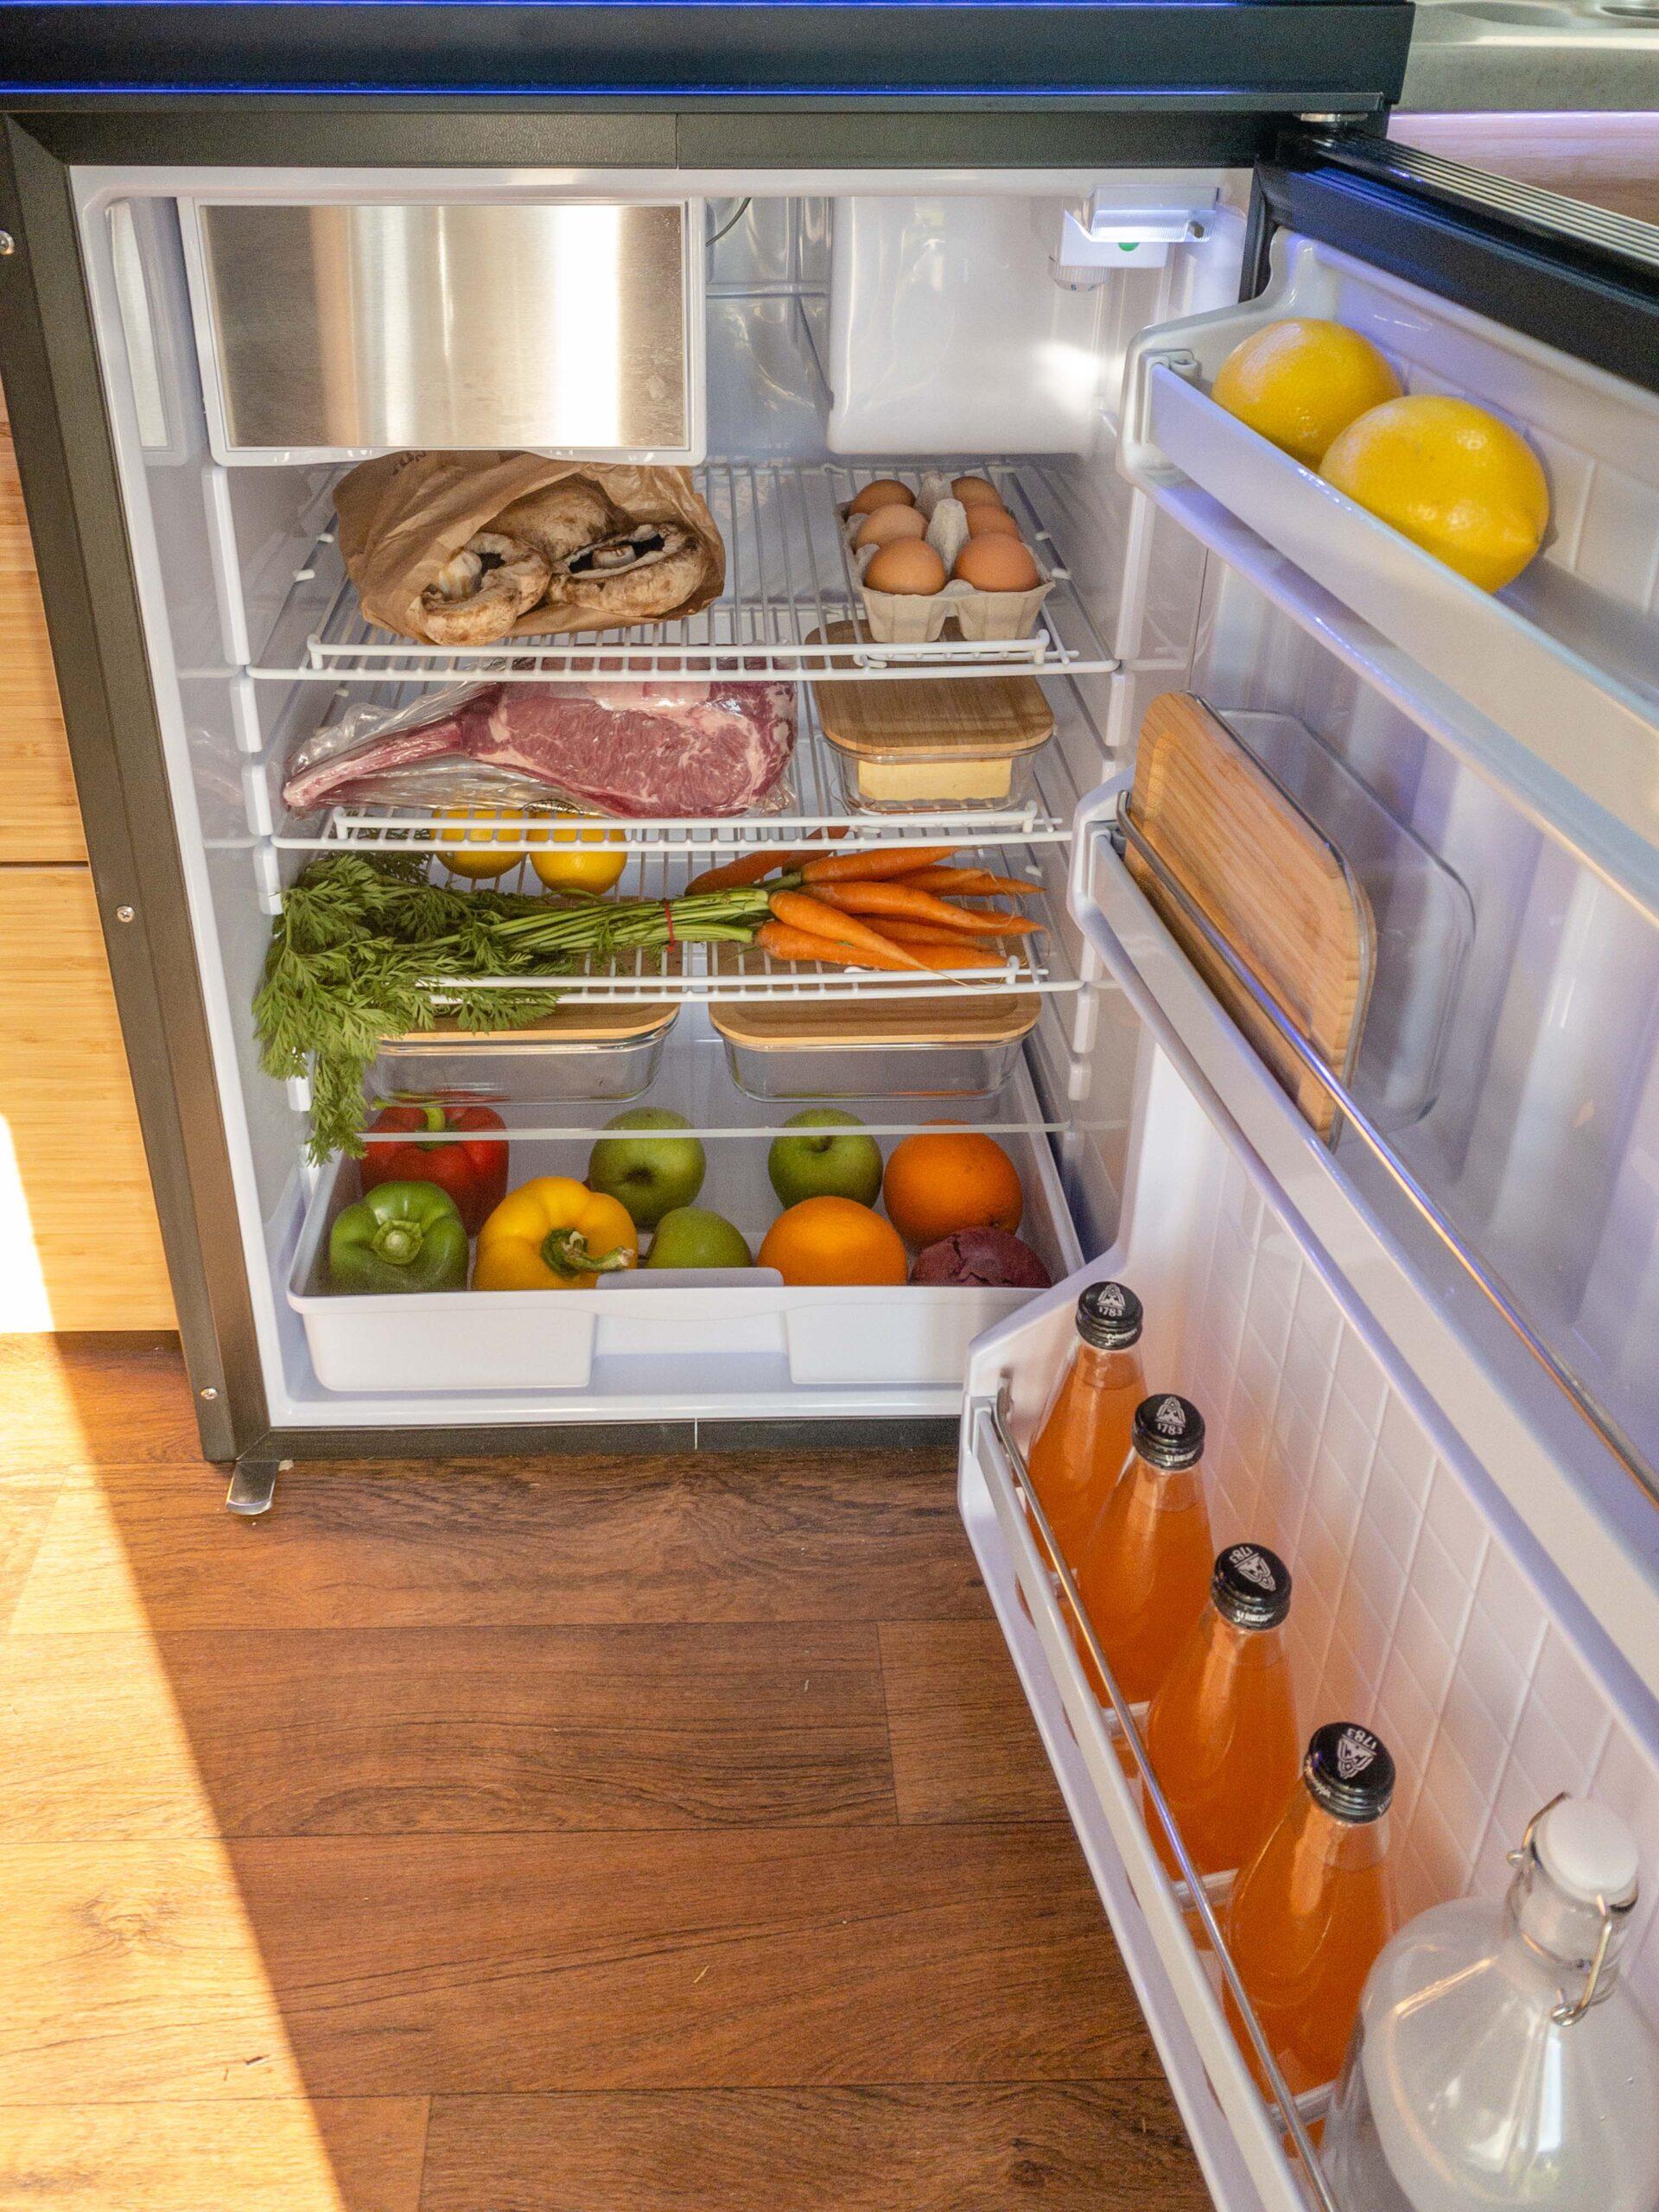 Kimberley Karavan 130L fridge